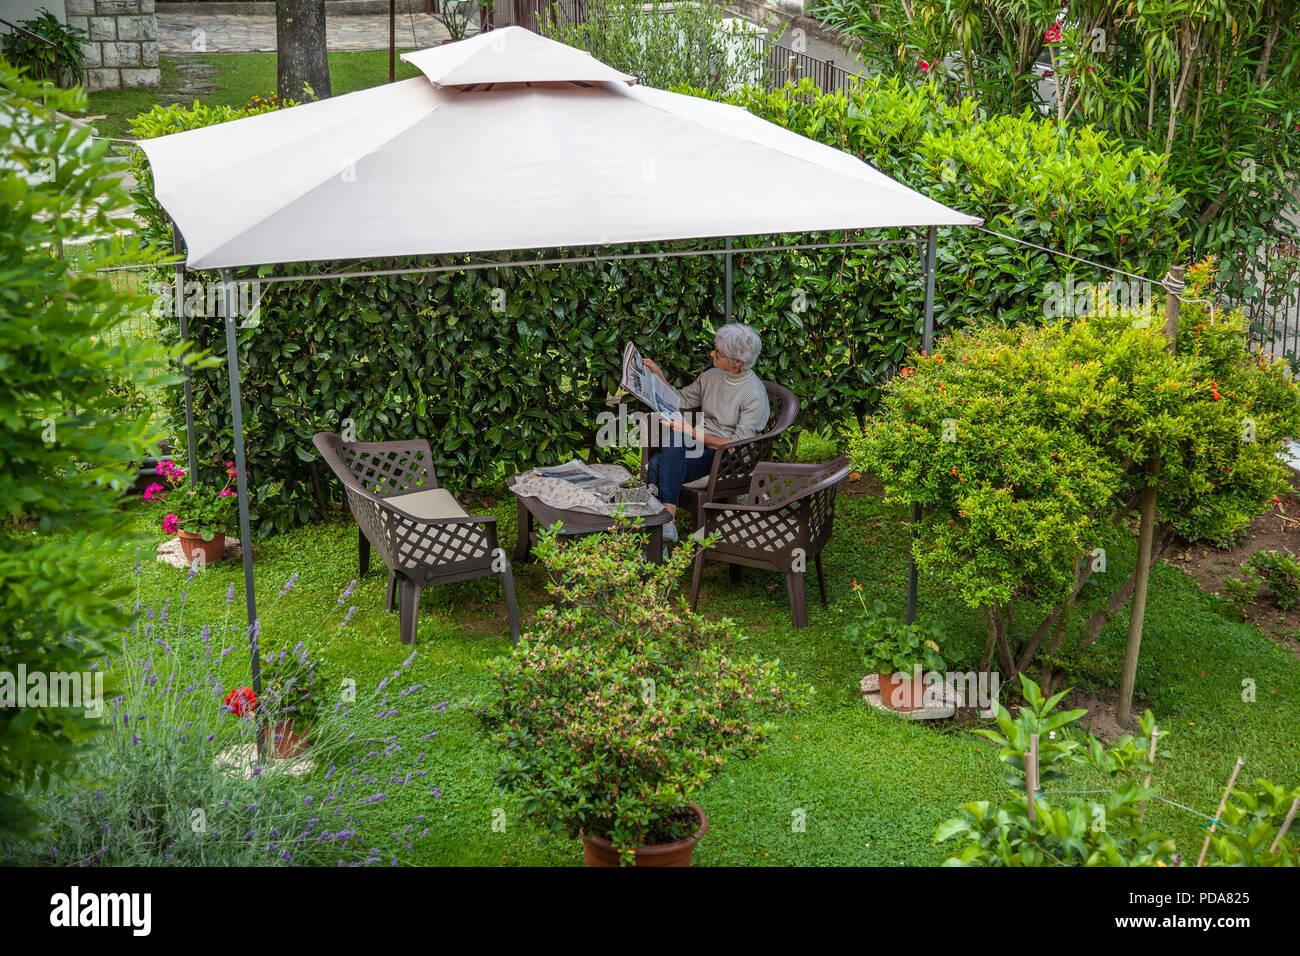 Le plaisir de la charla en vacances (Lucques - Toscane - Italie). El placer de la lectura en vacaciones (Lucca - Toscana - Italia). Imagen De Stock